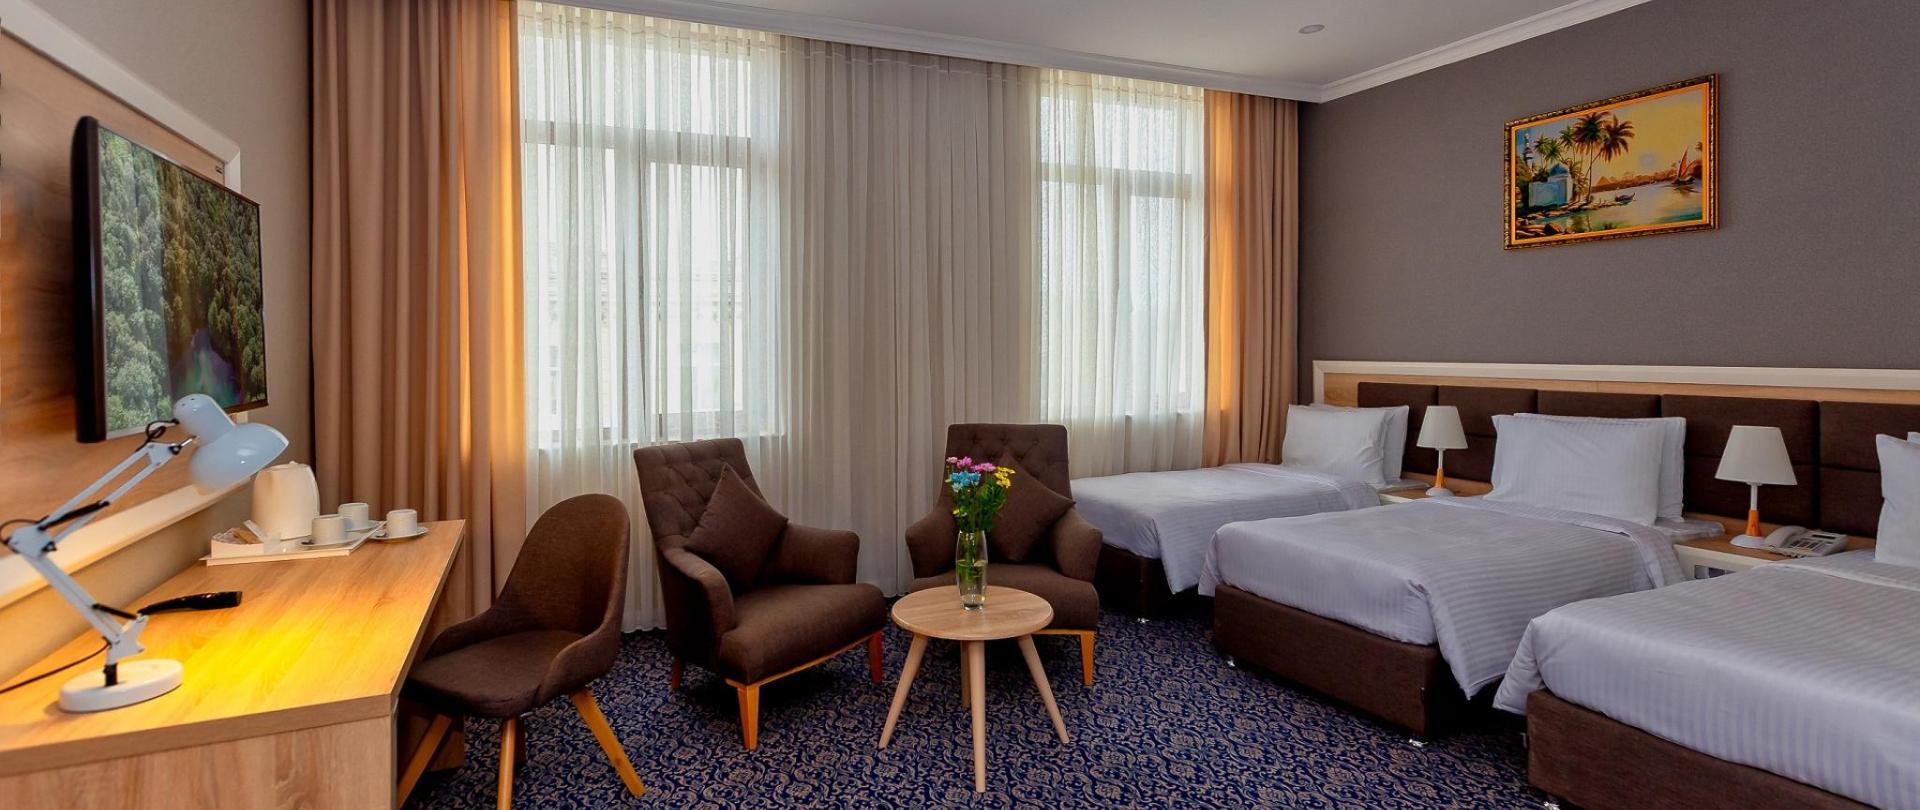 Metrocity Hotel-3.jpg